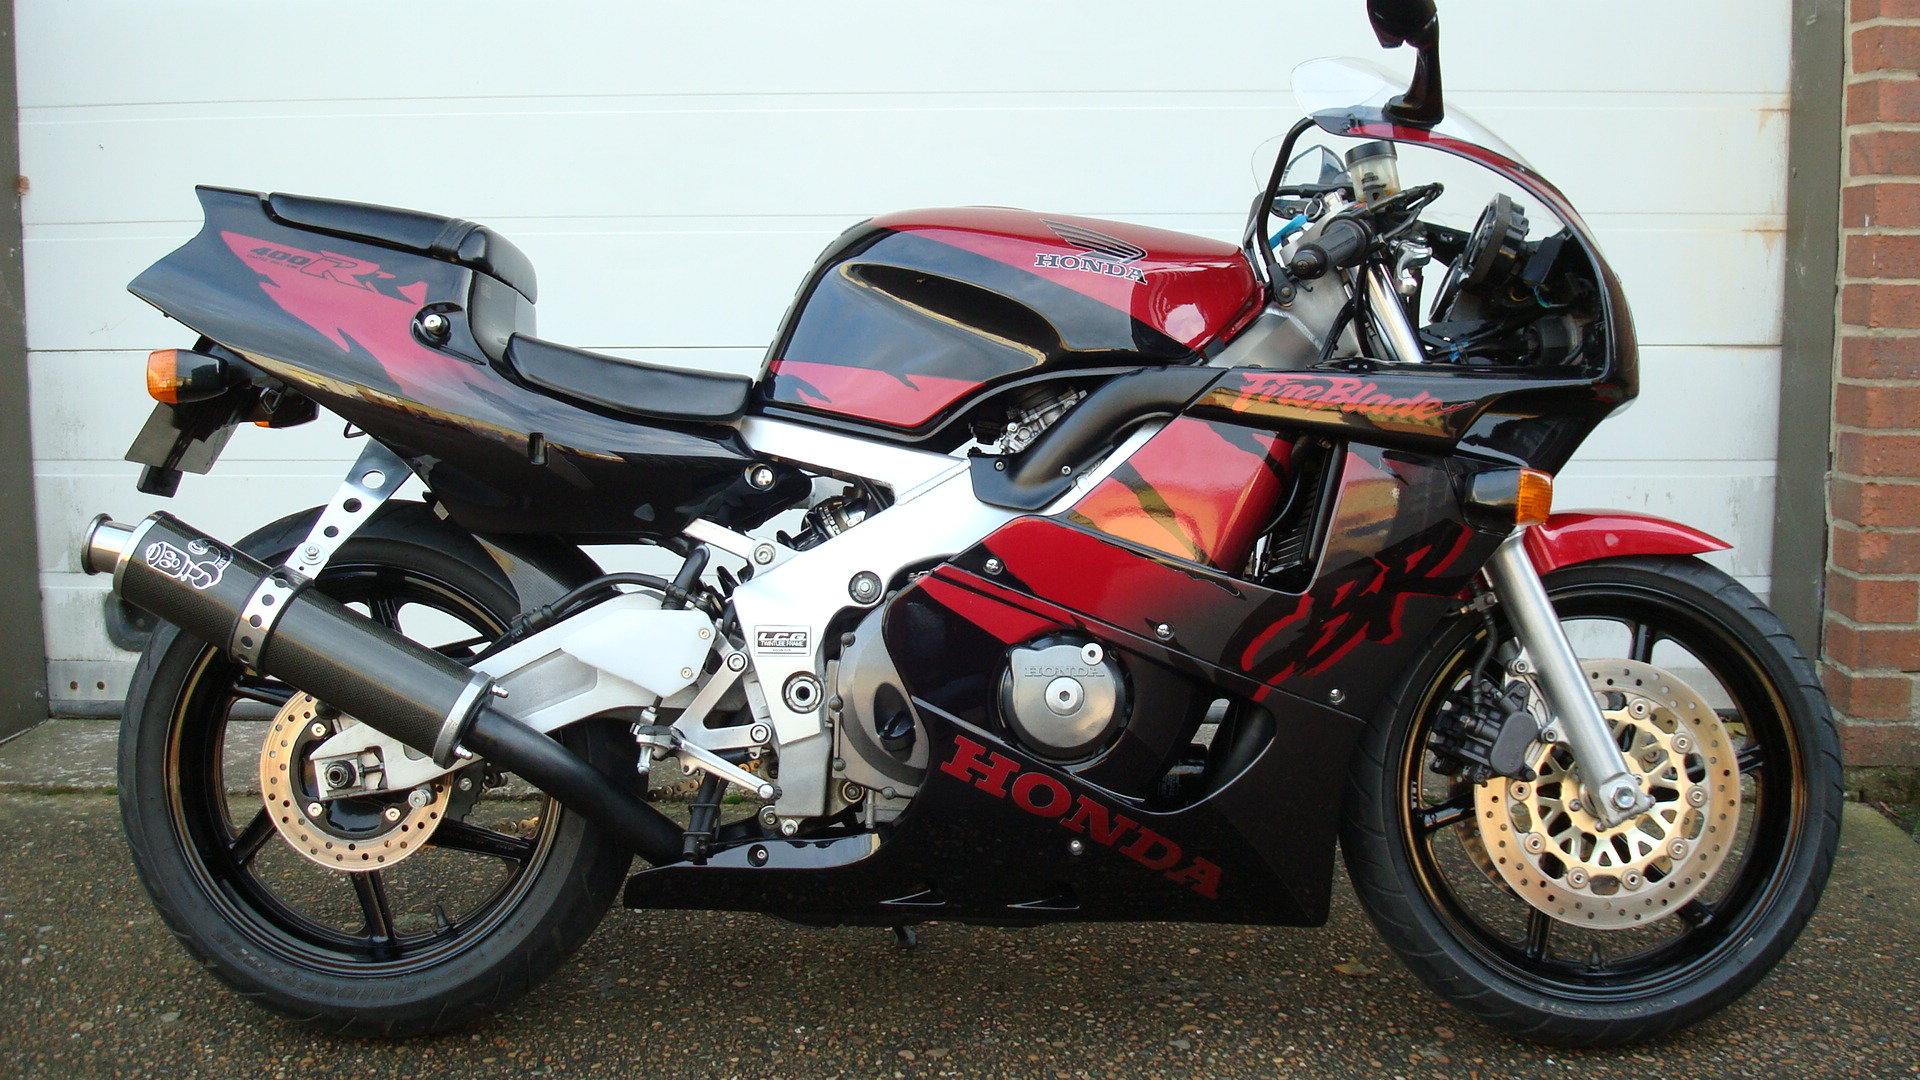 Honda CBR400 RR-R 1998-R **LOW KMS,EXCELLENT CONDITION** For Sale (picture 1 of 6)